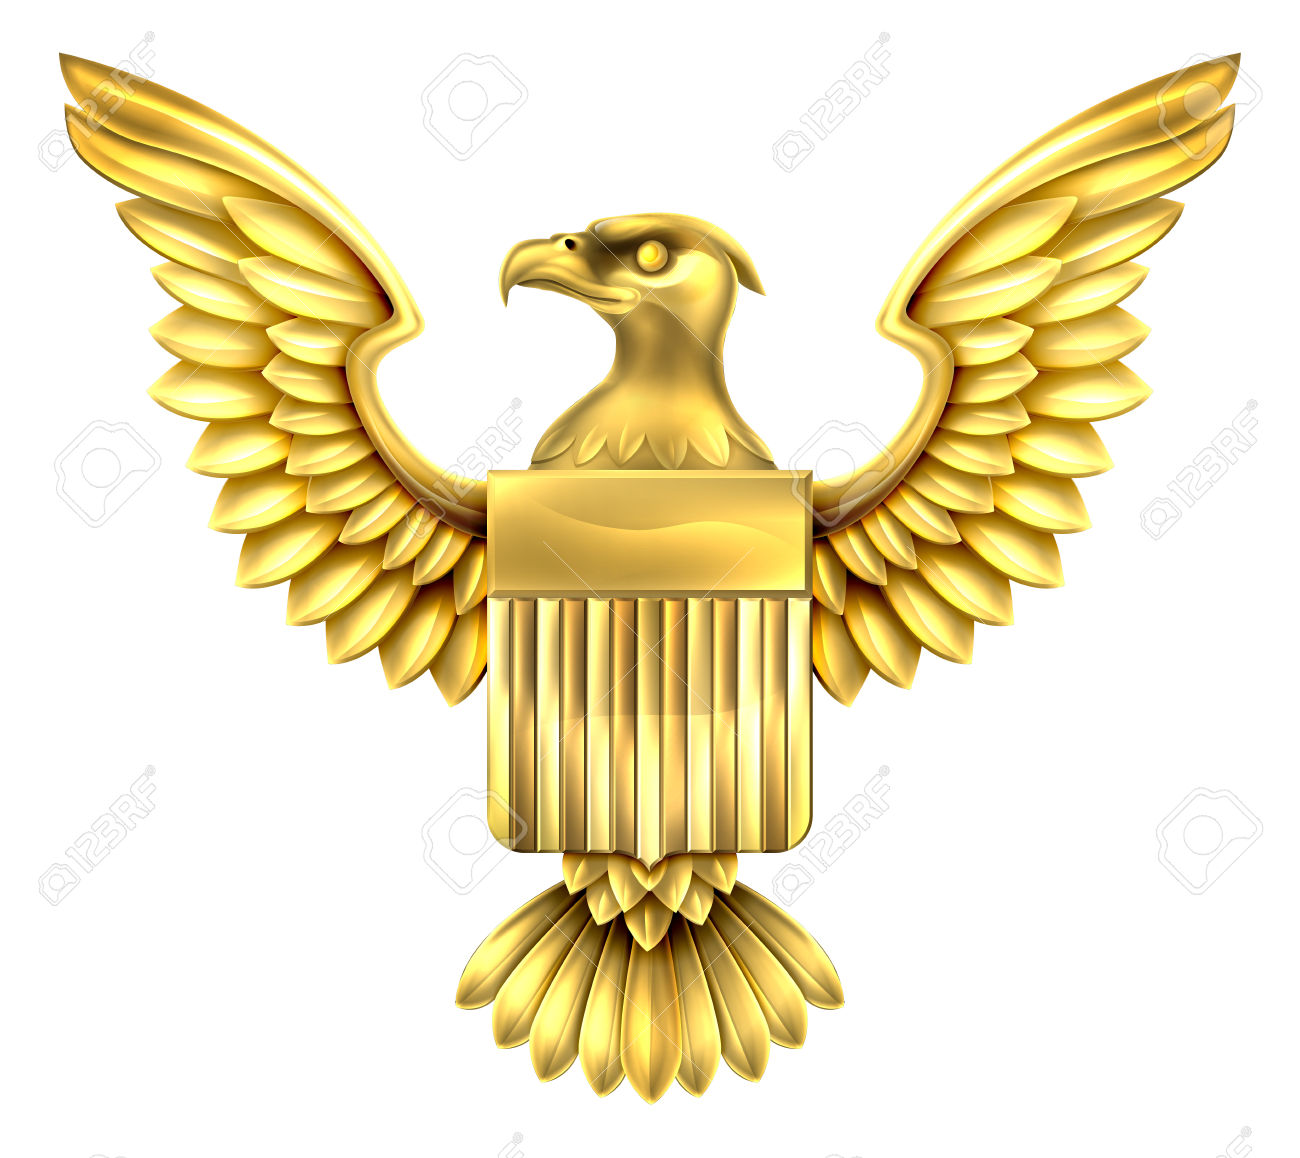 Eagle cross flag clipart.